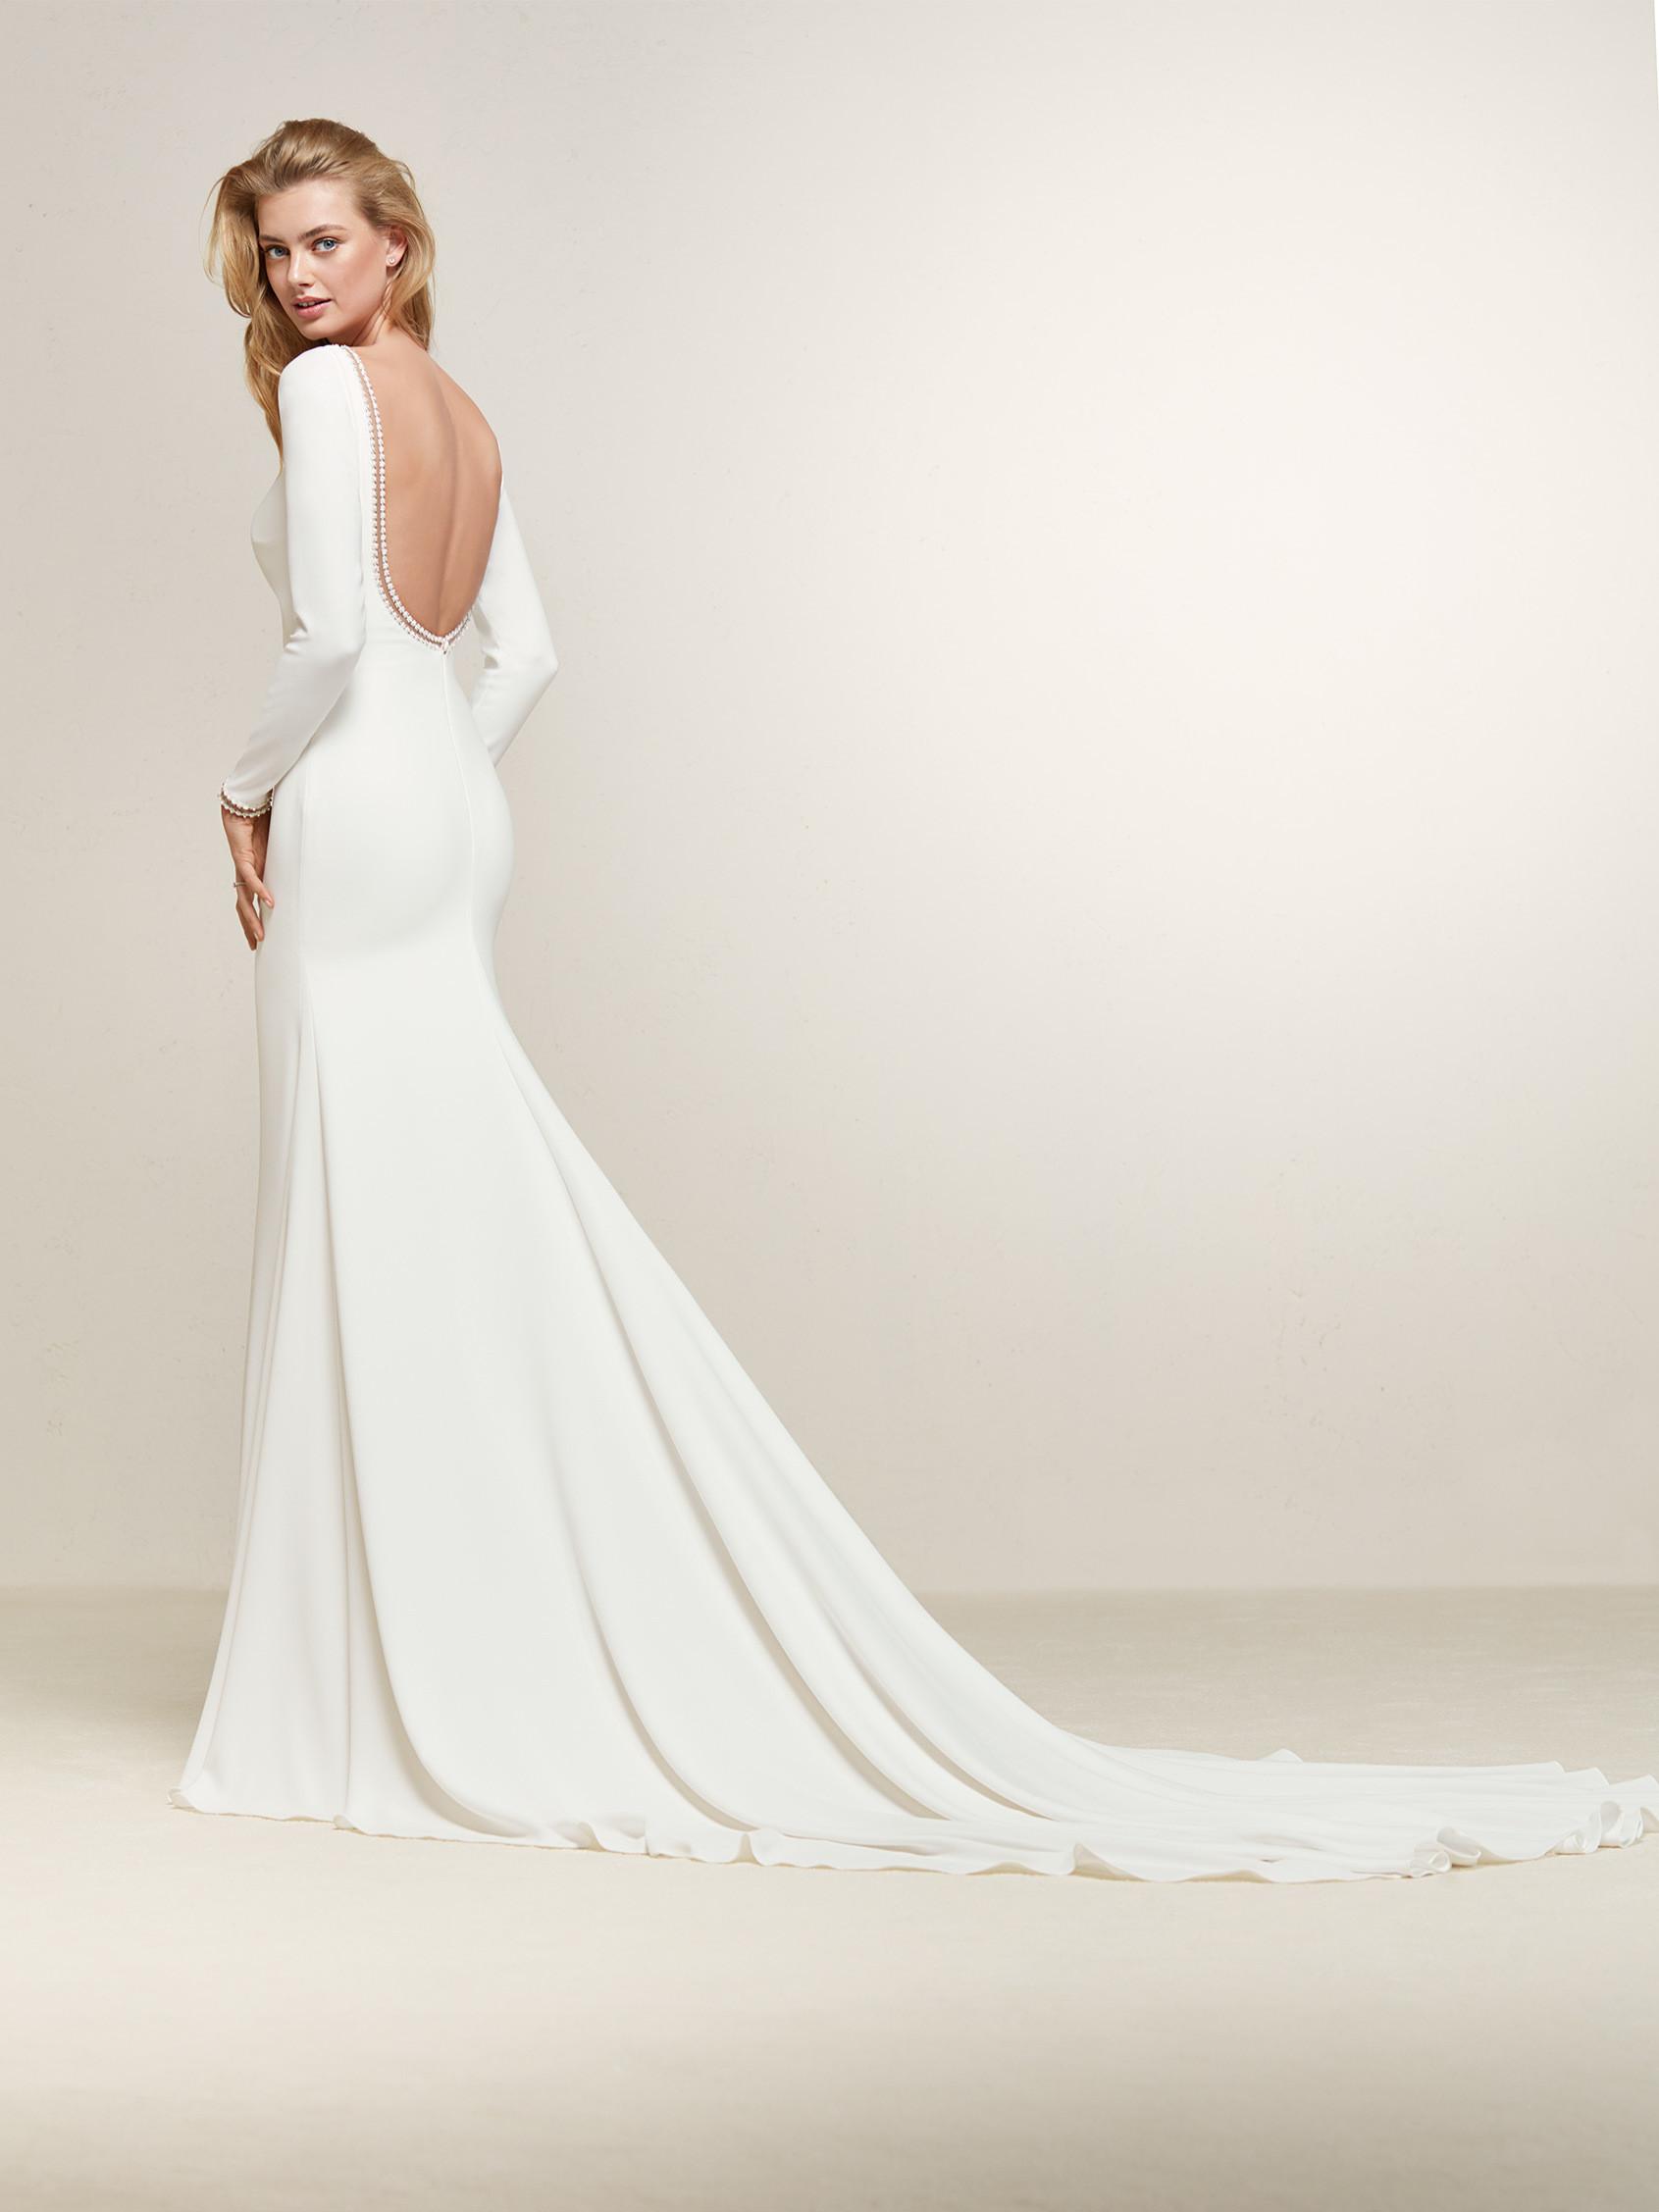 plain simple wedding dresses photo - 1